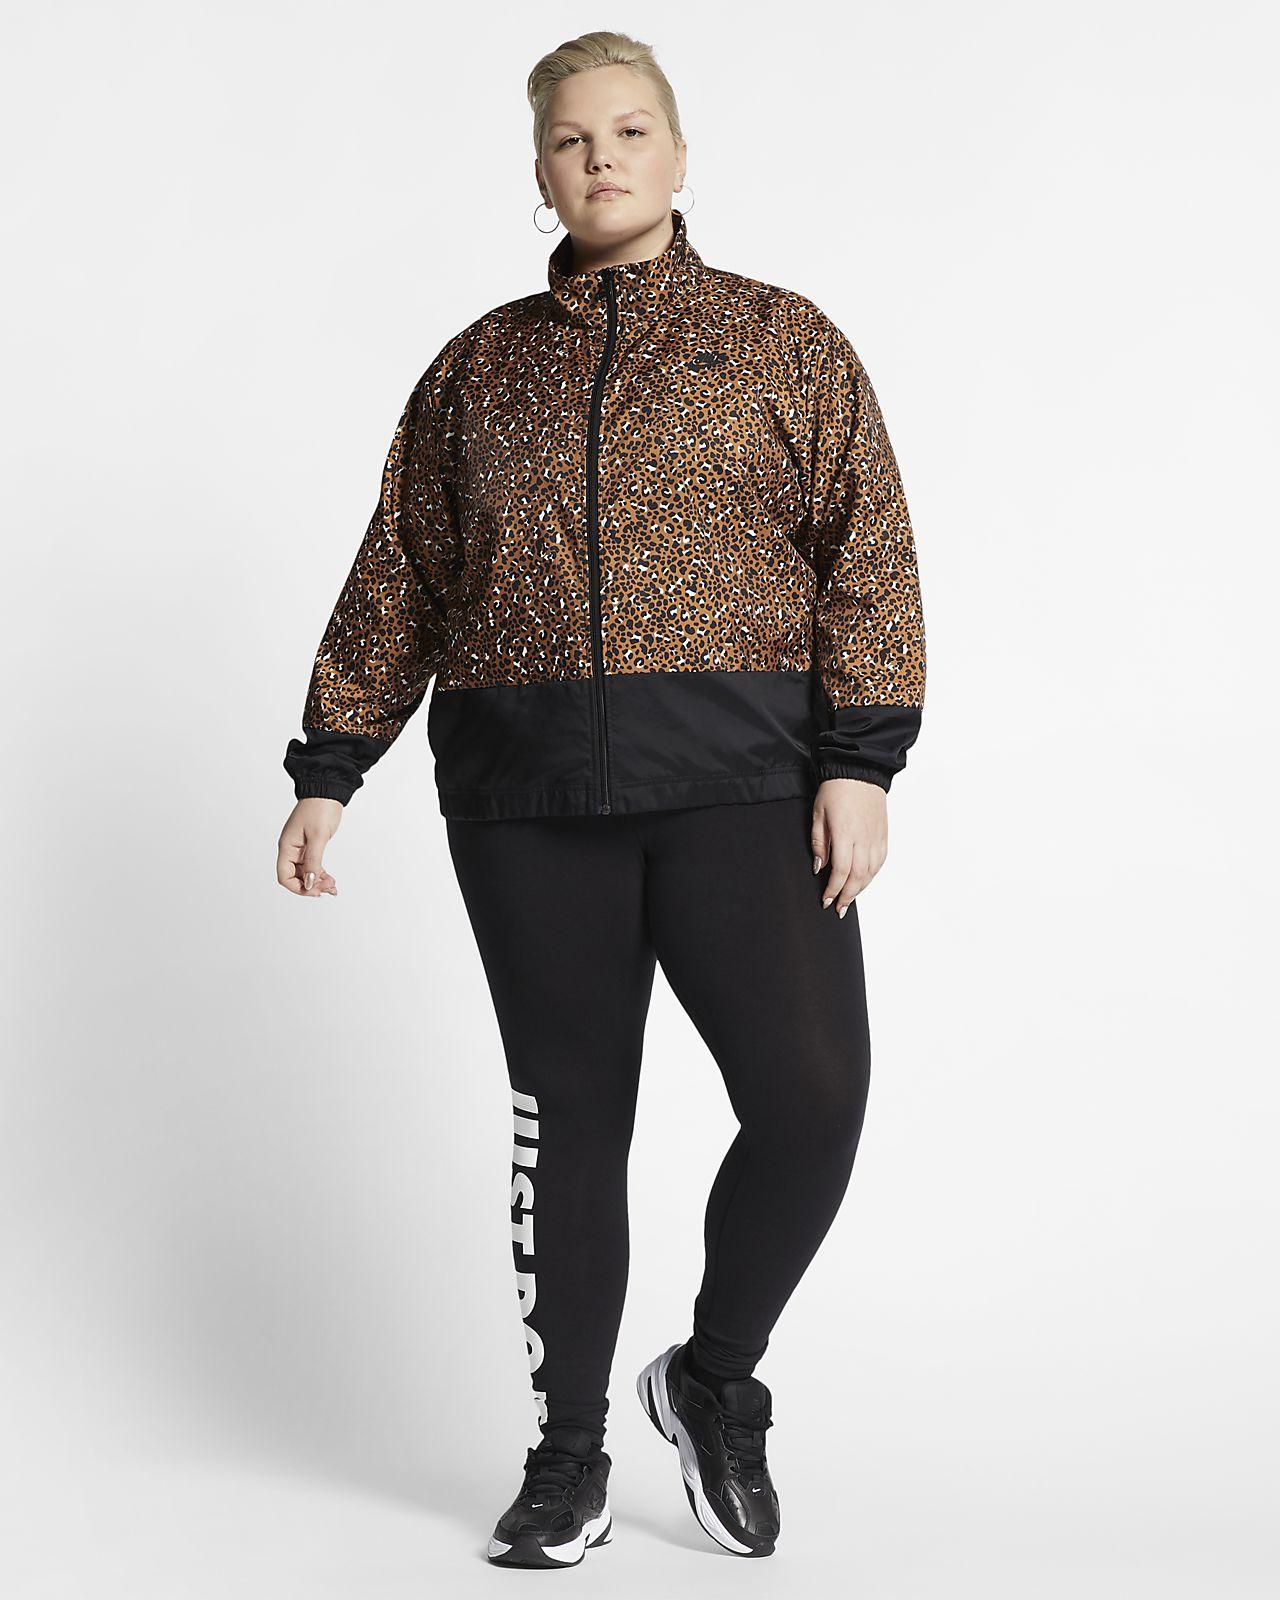 Nike Sportswear Animal Print Damen-Webjacke (große Größe)